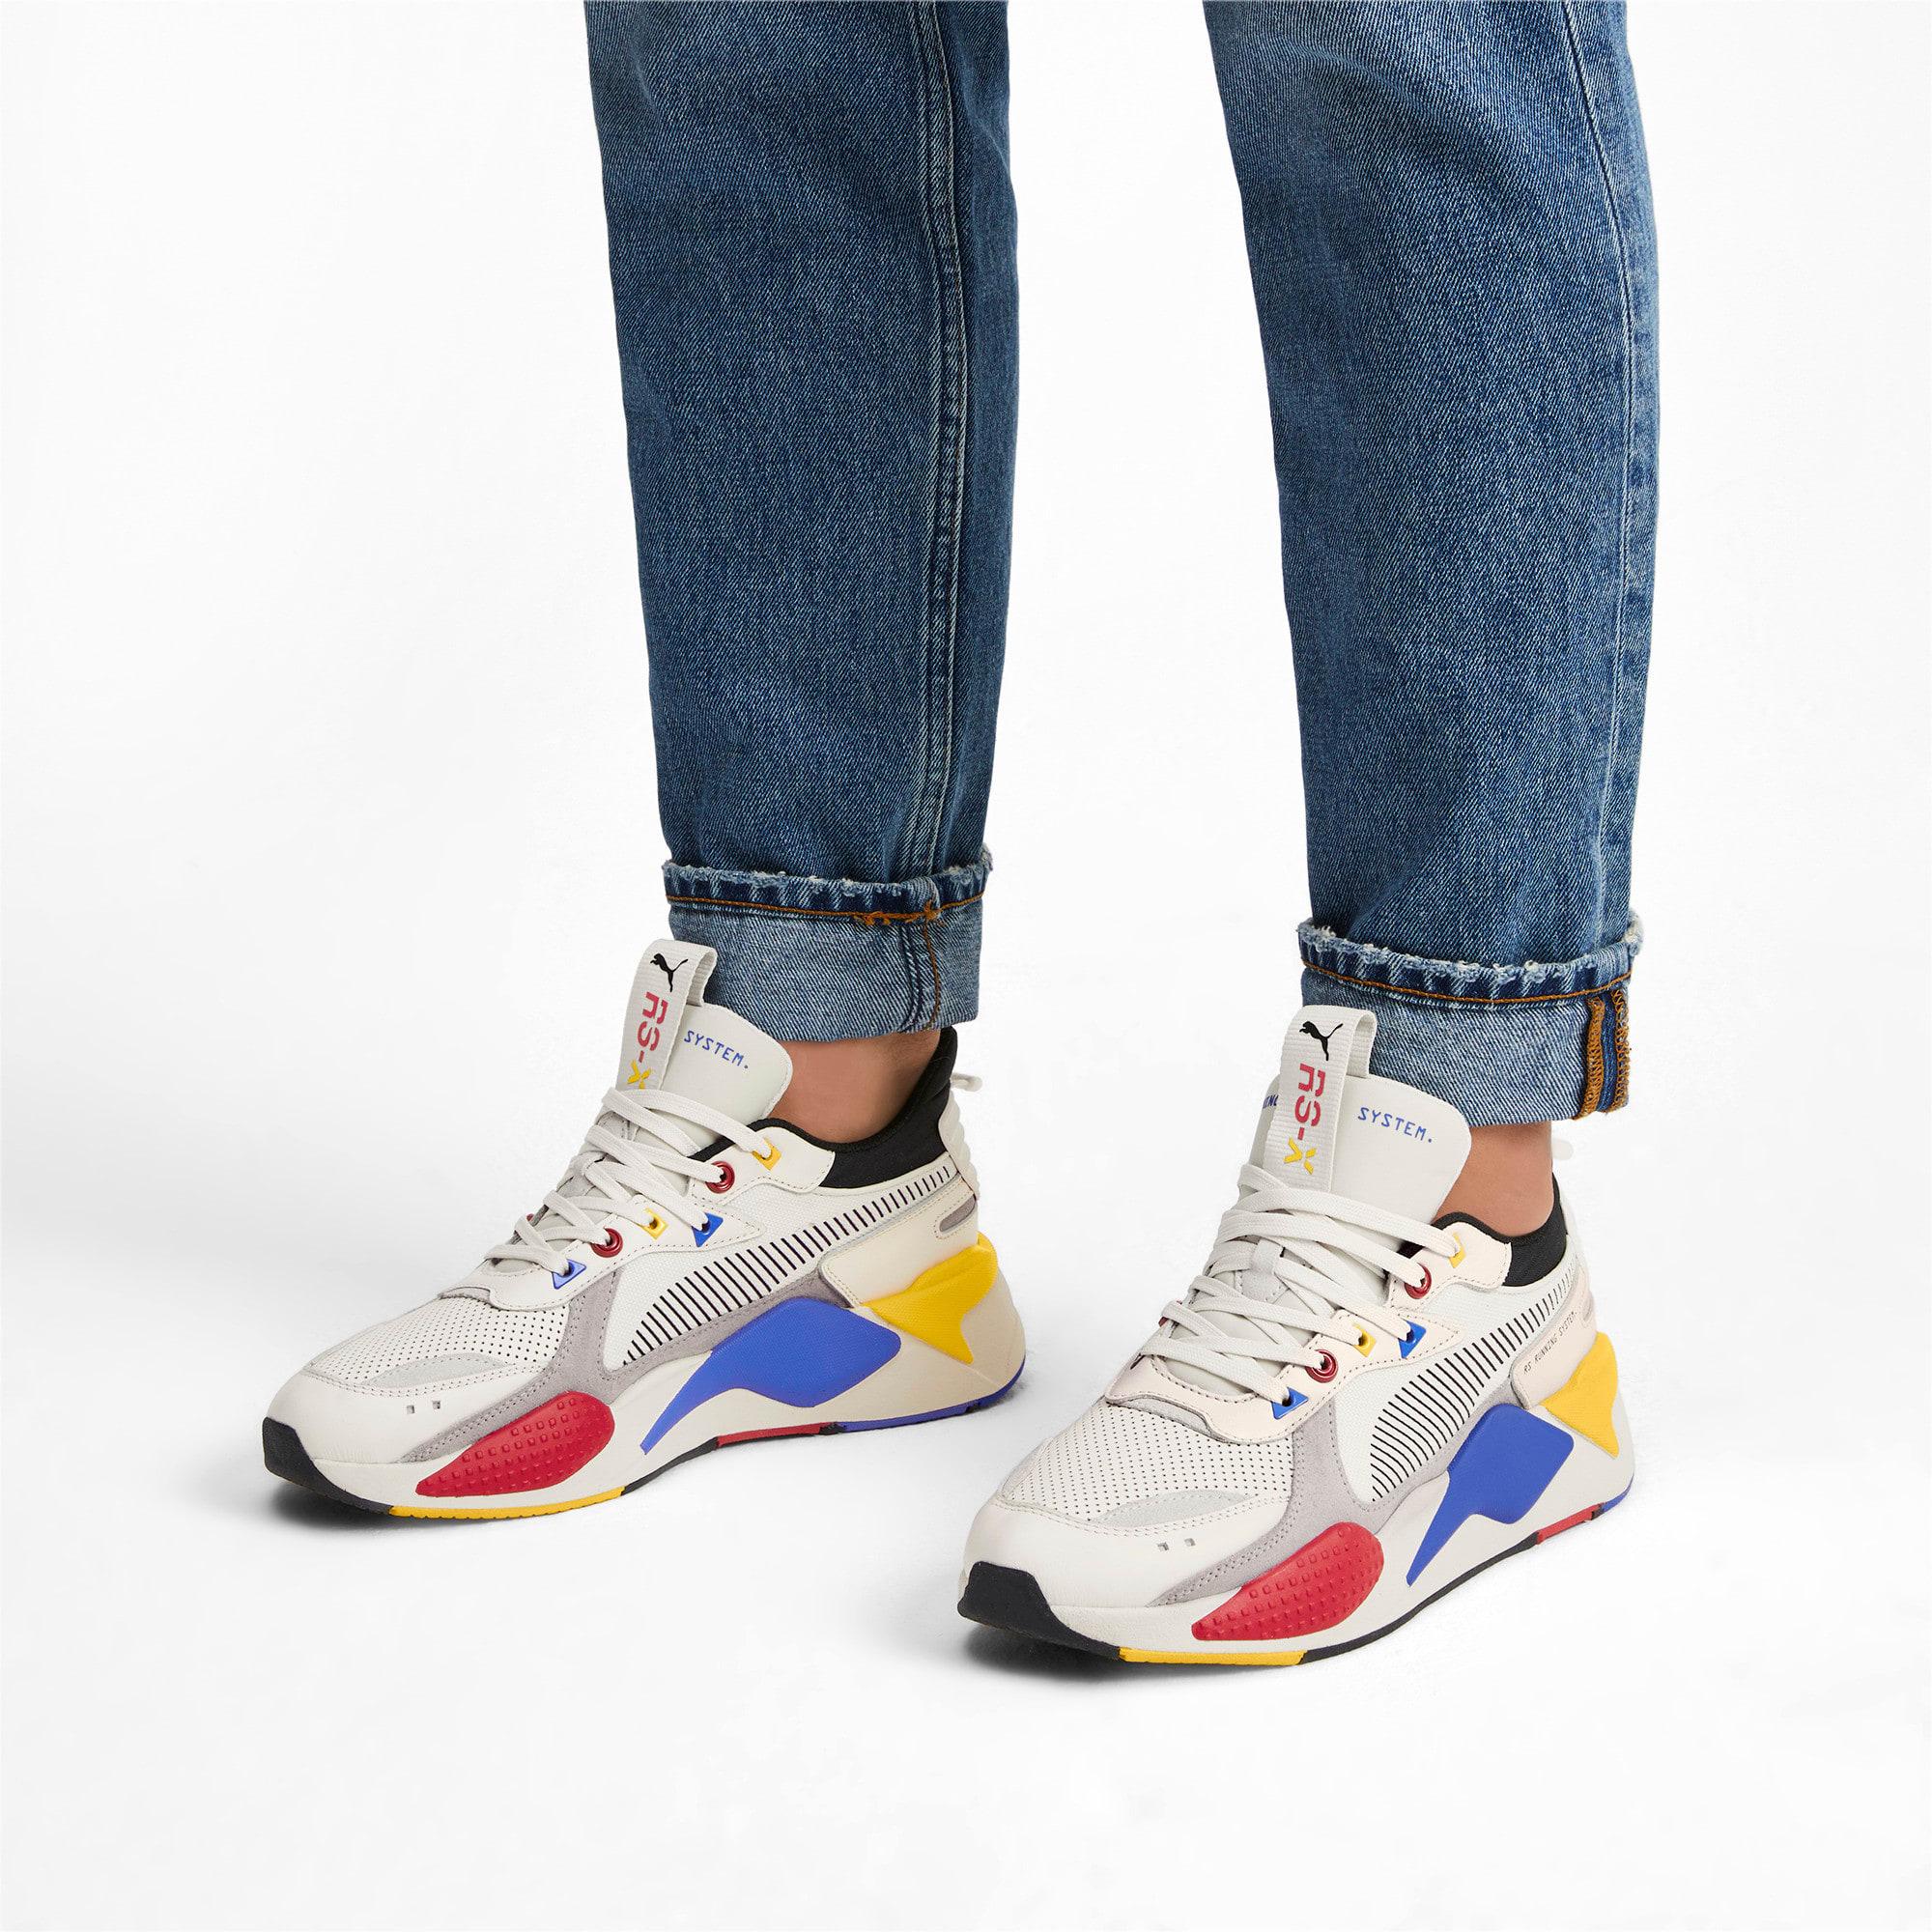 Thumbnail 2 of RS-X Colour Theory Sneaker, Whisper White-Puma Black, medium